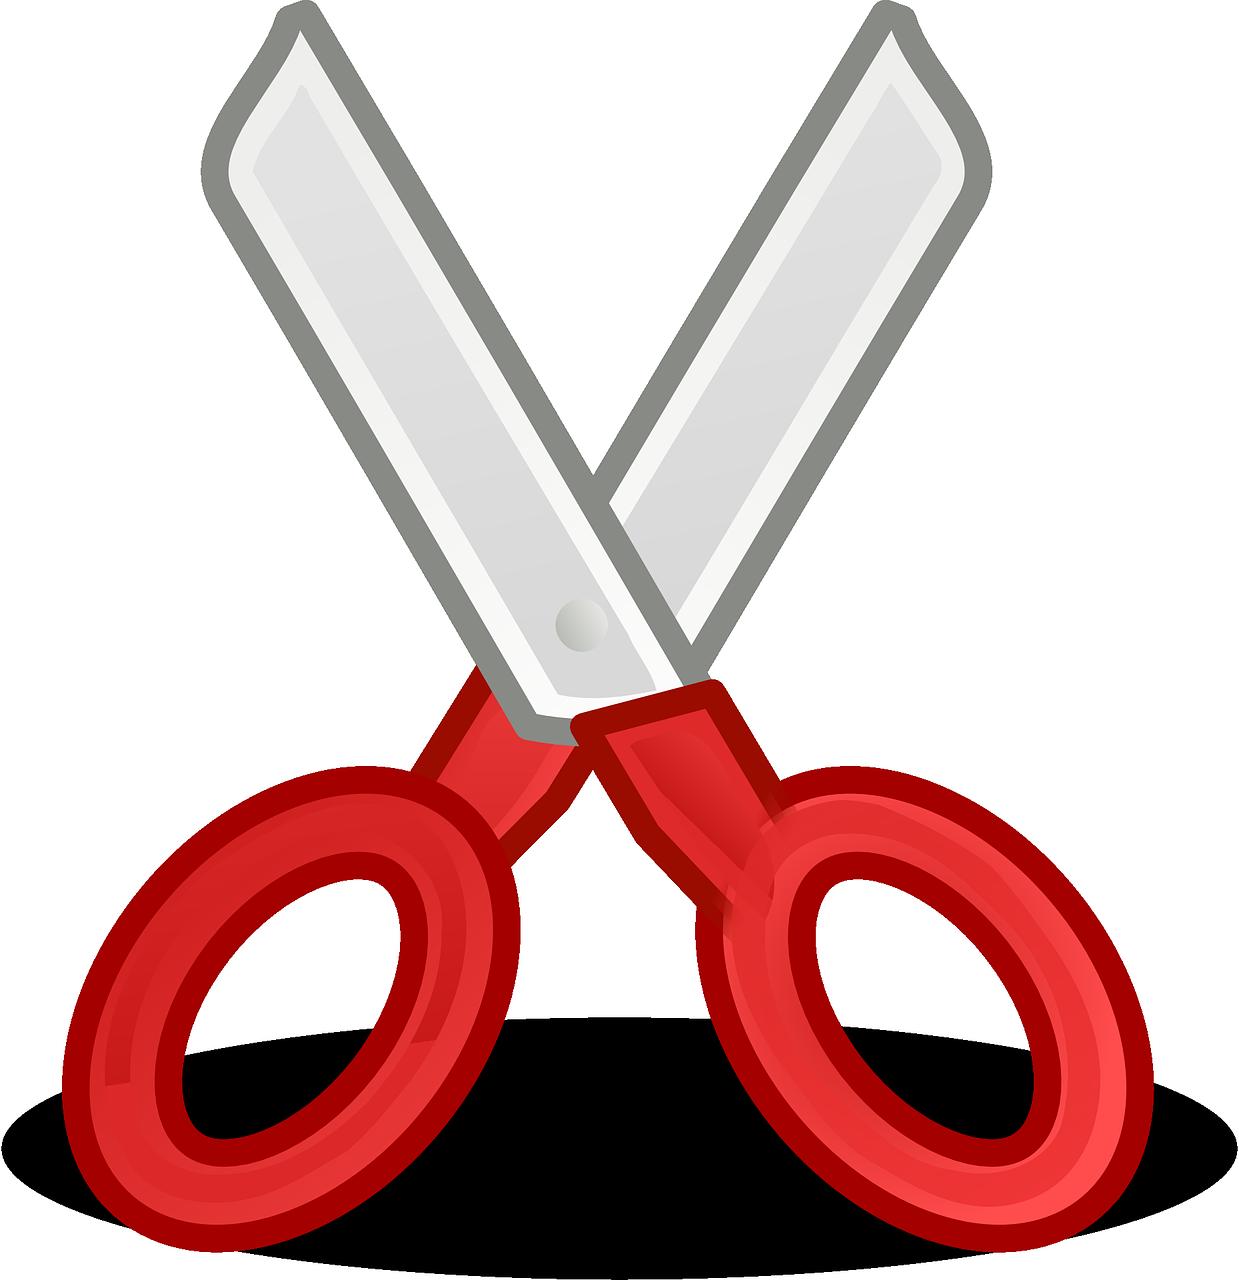 Free to Use & Public Domain Scissors Clip Art.